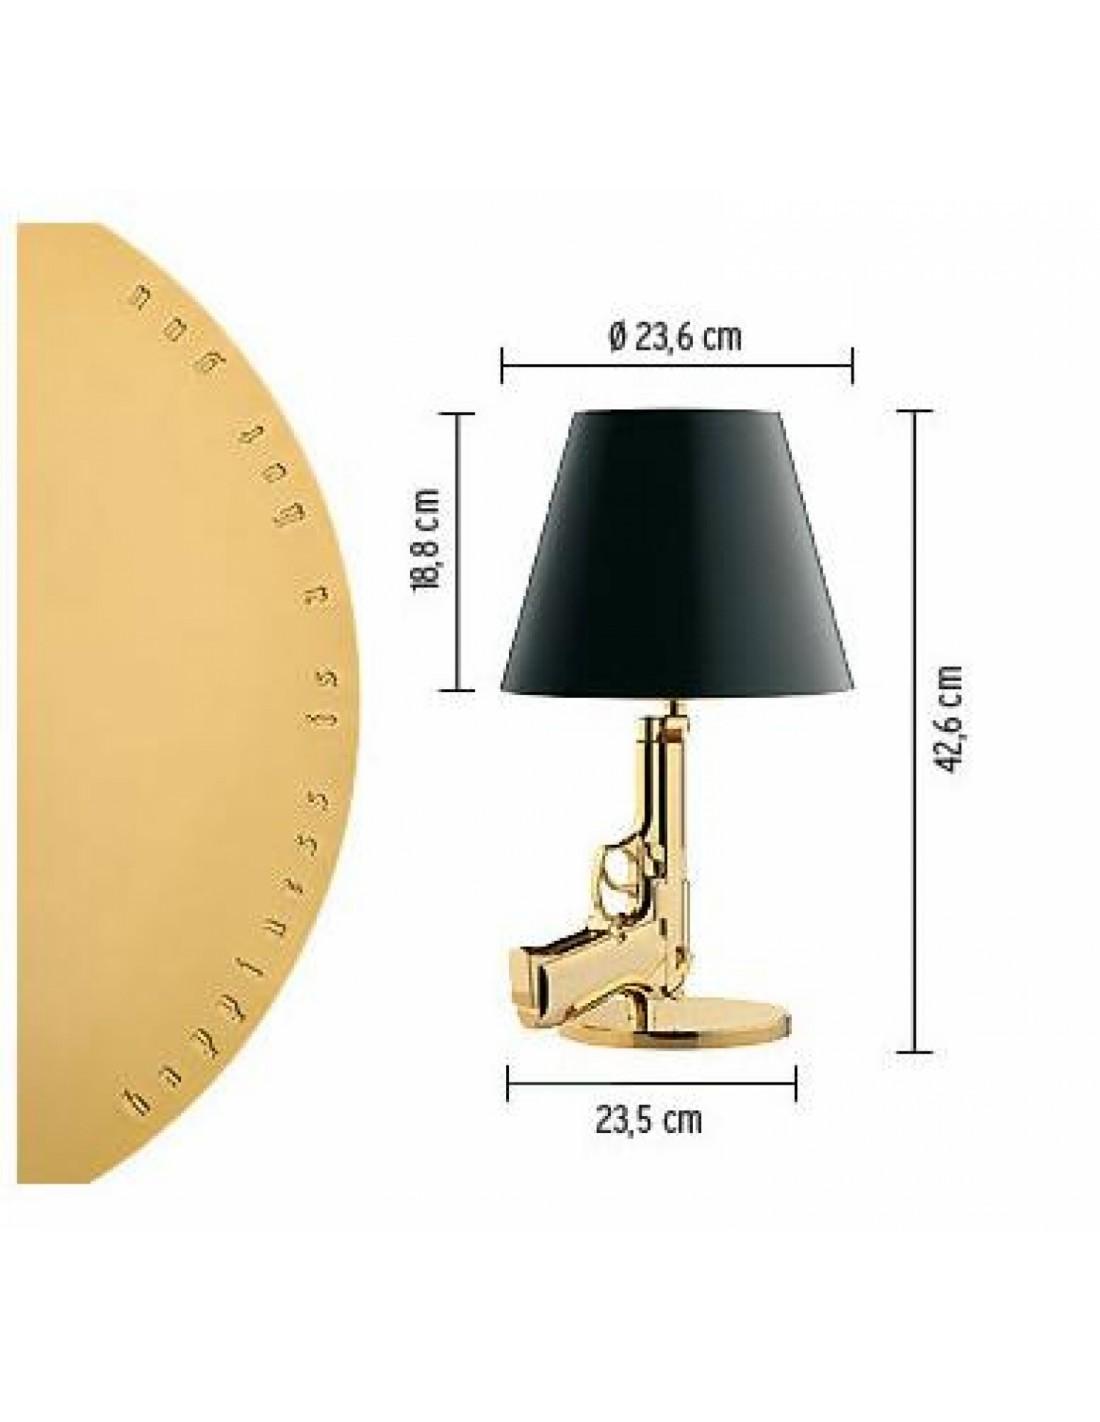 Lampe de table Bedside Gun Philippe Starck Flos Valente Design